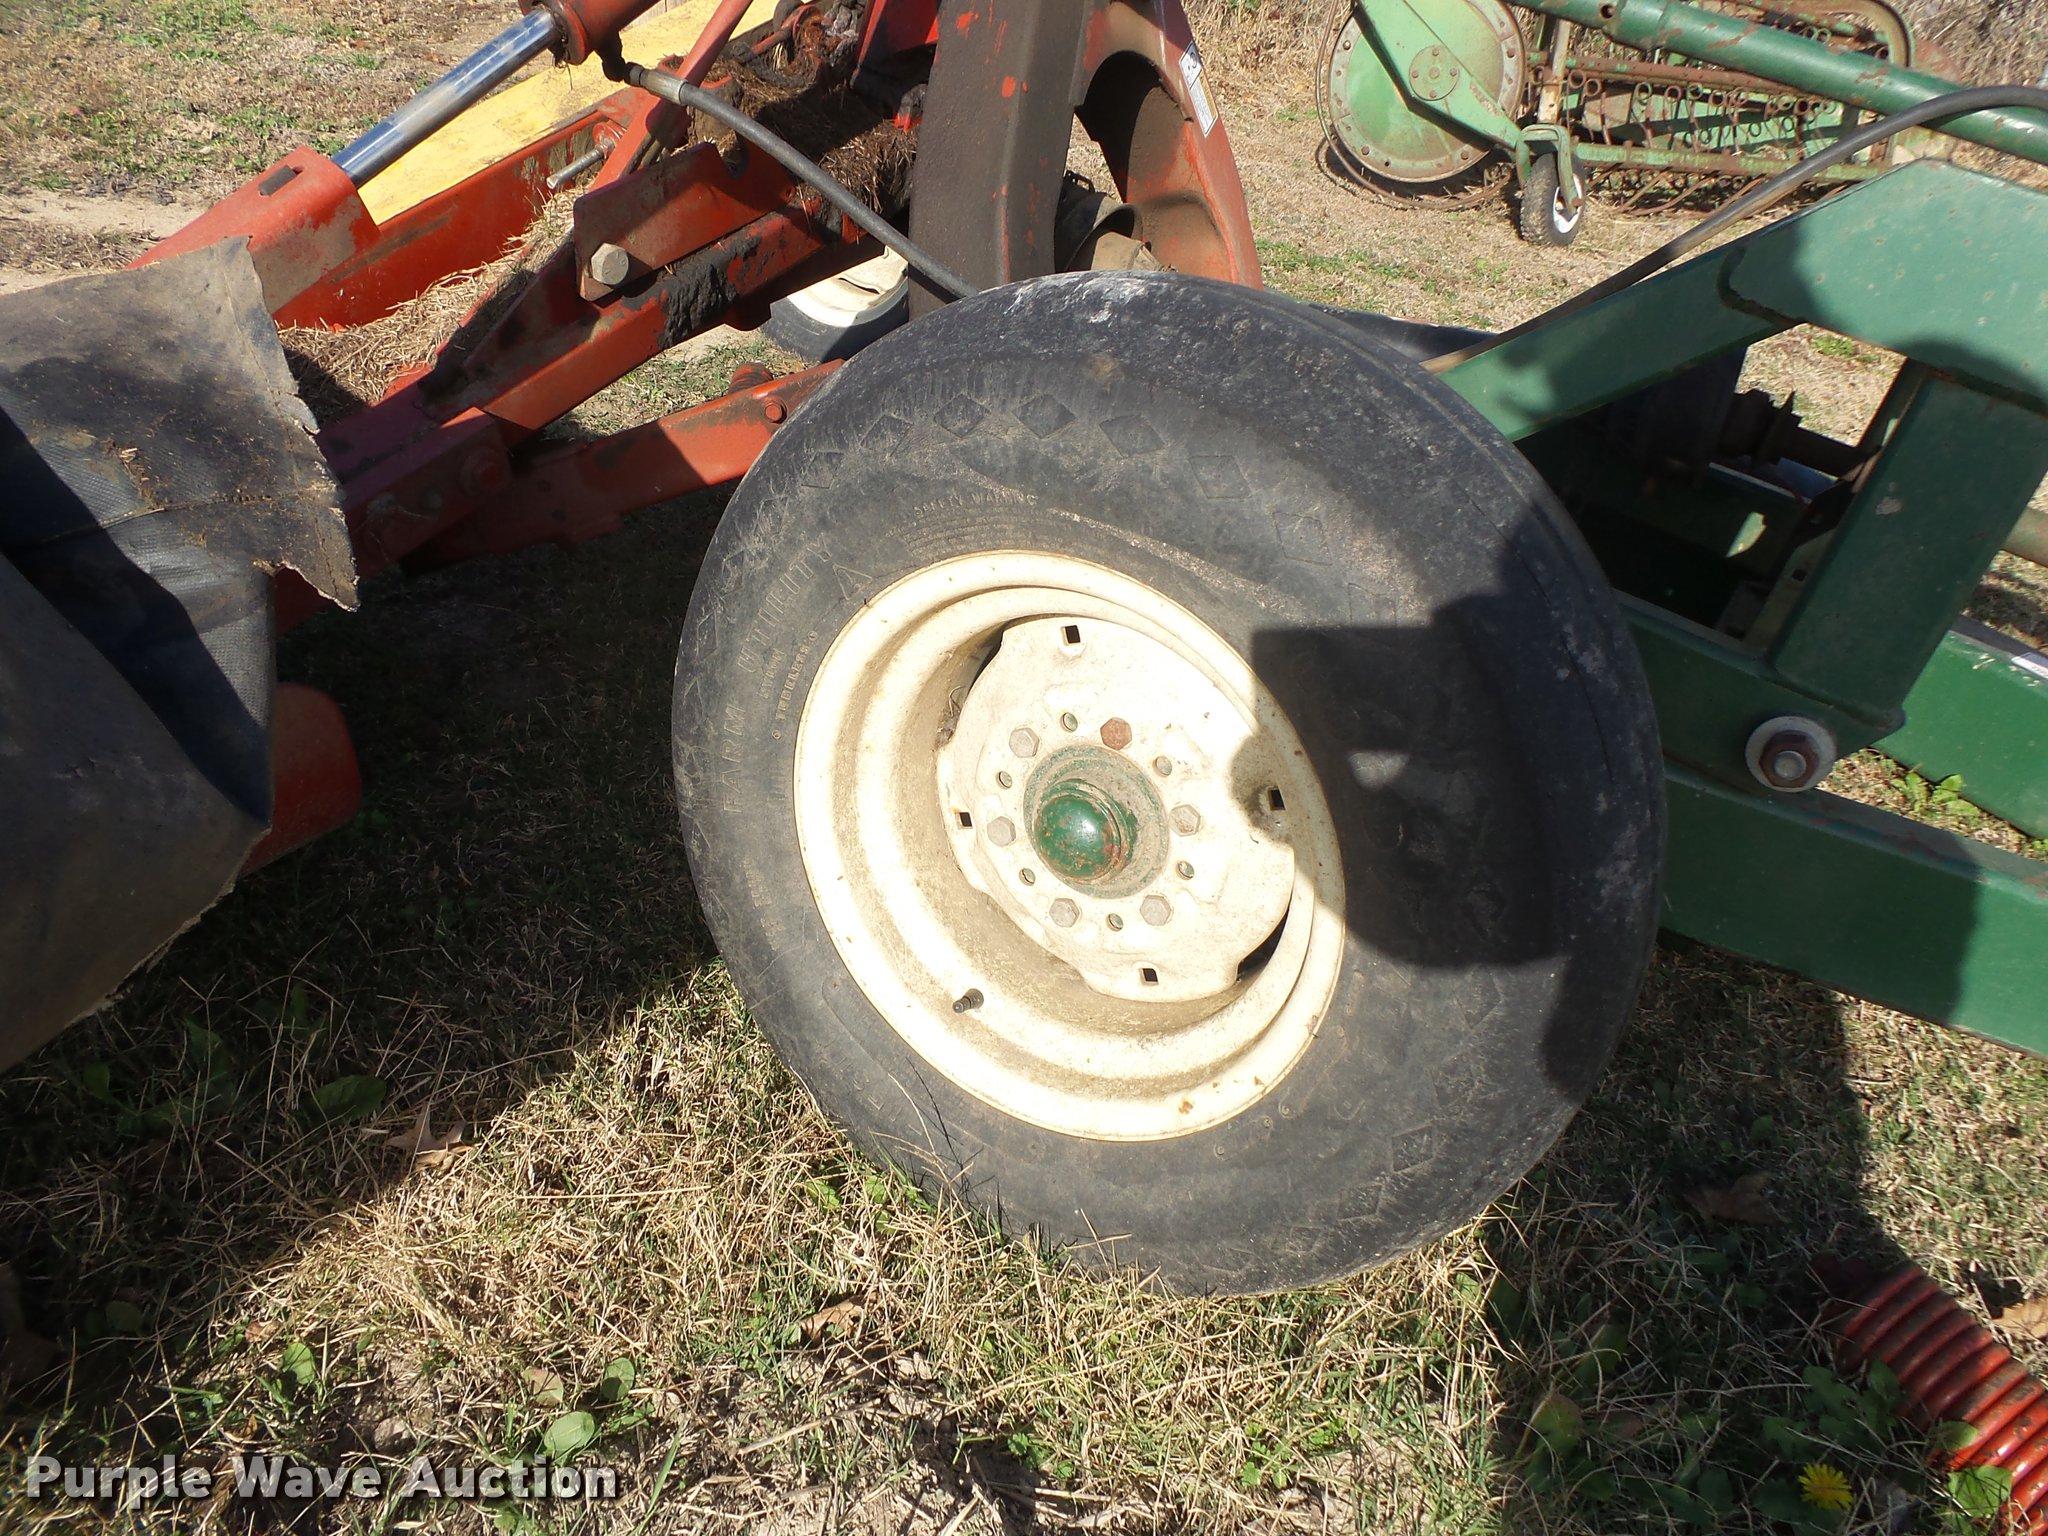 New Holland 617 disc mower | Item DS9649 | SOLD! December 27